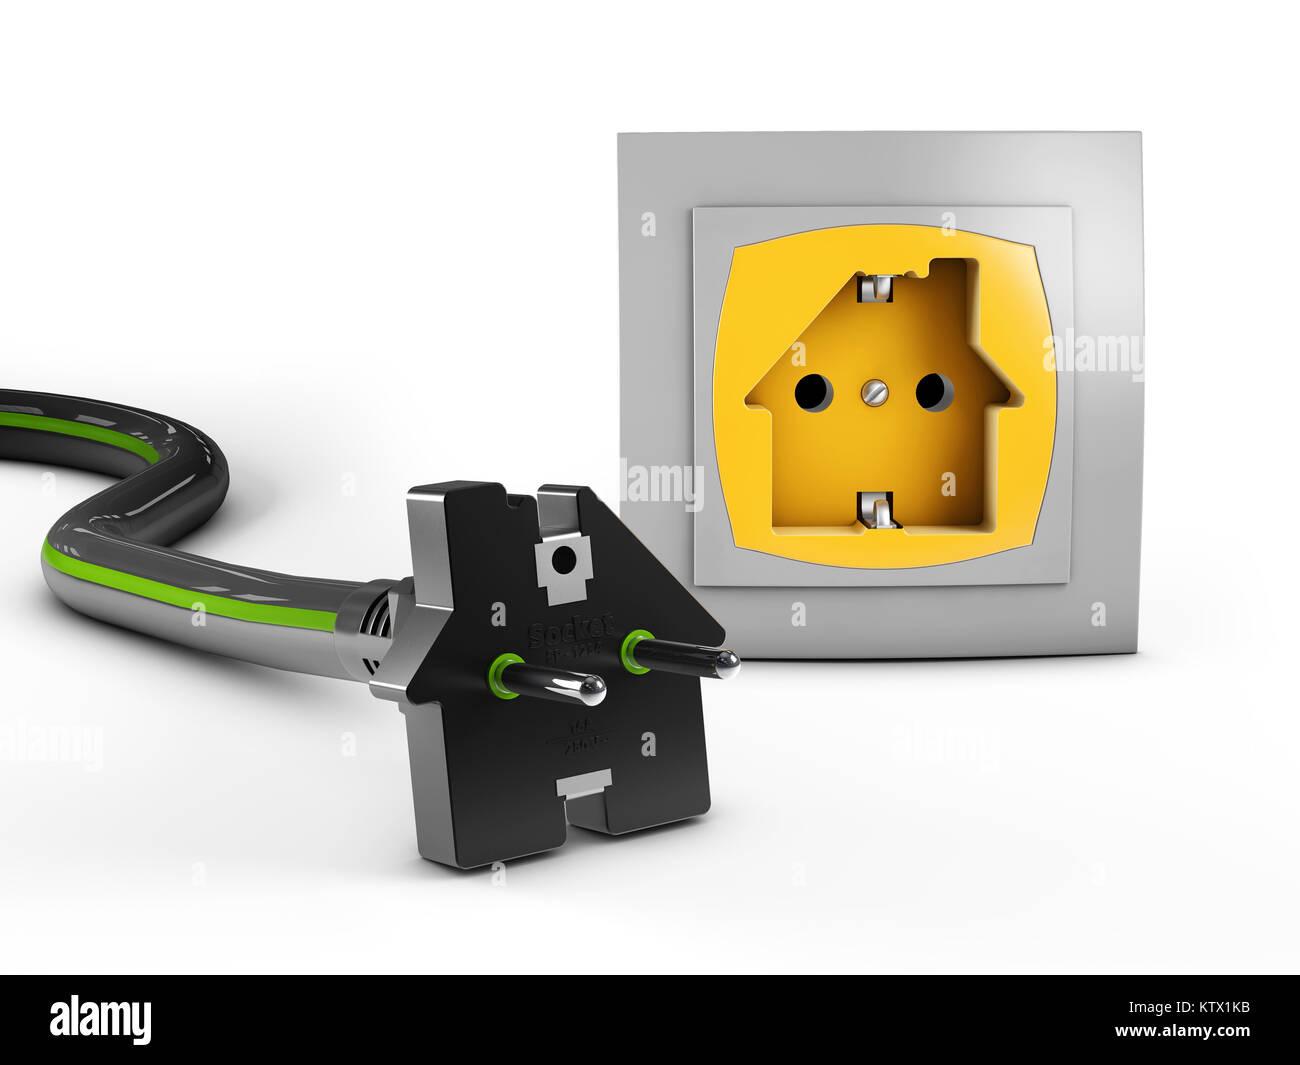 Plug And Socket Icon Stockfotos & Plug And Socket Icon Bilder - Alamy